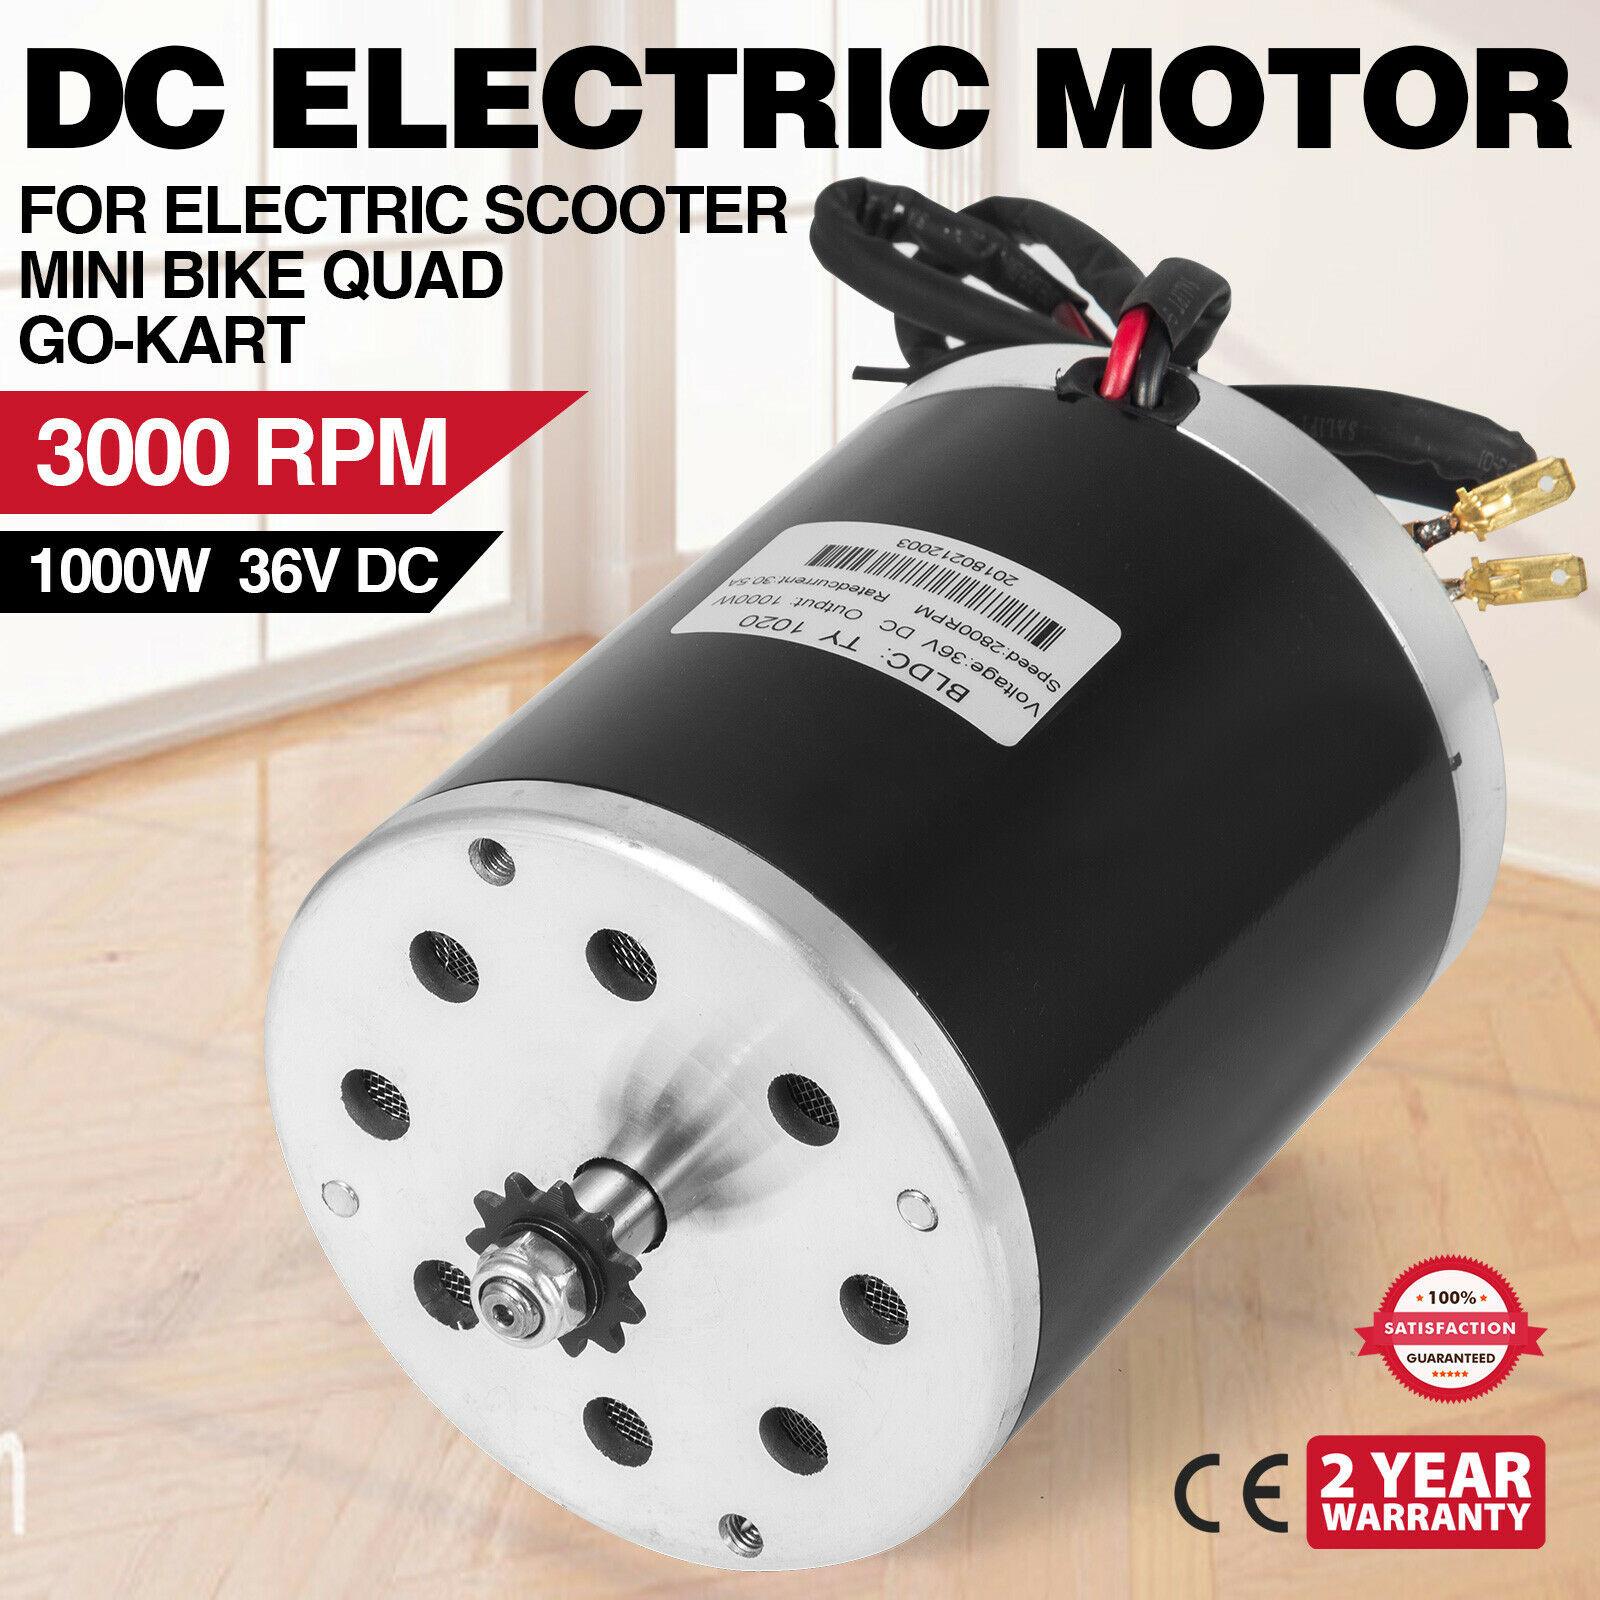 1000W 48V DC Electric Motor scooter mini bike TY1020 Quad TDM Go-kart bracket